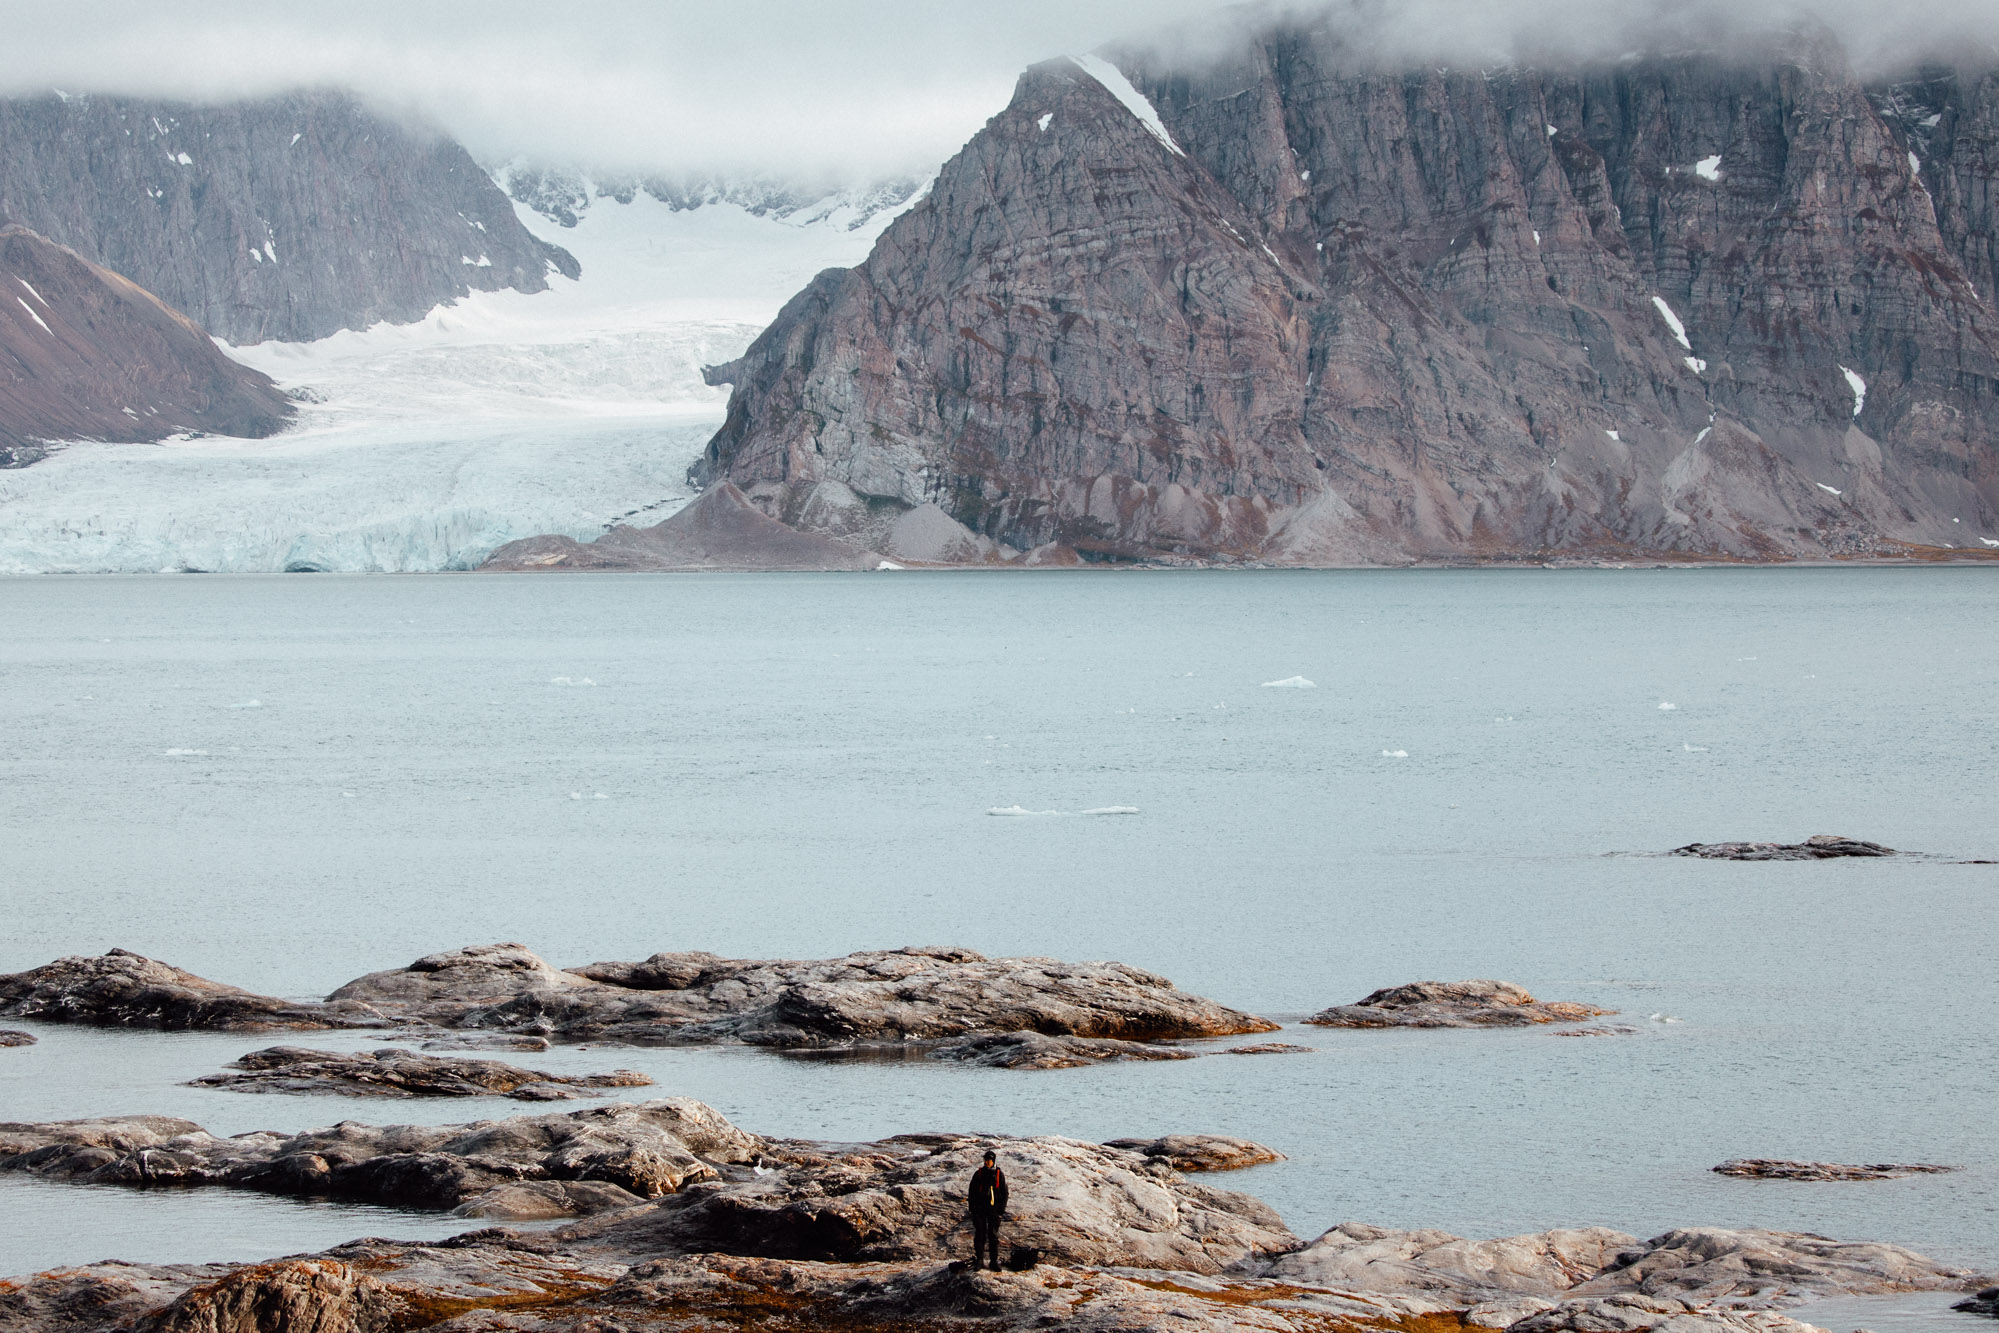 Glacier and beach landscapes in Svalbard, Spitsbergen, Norway